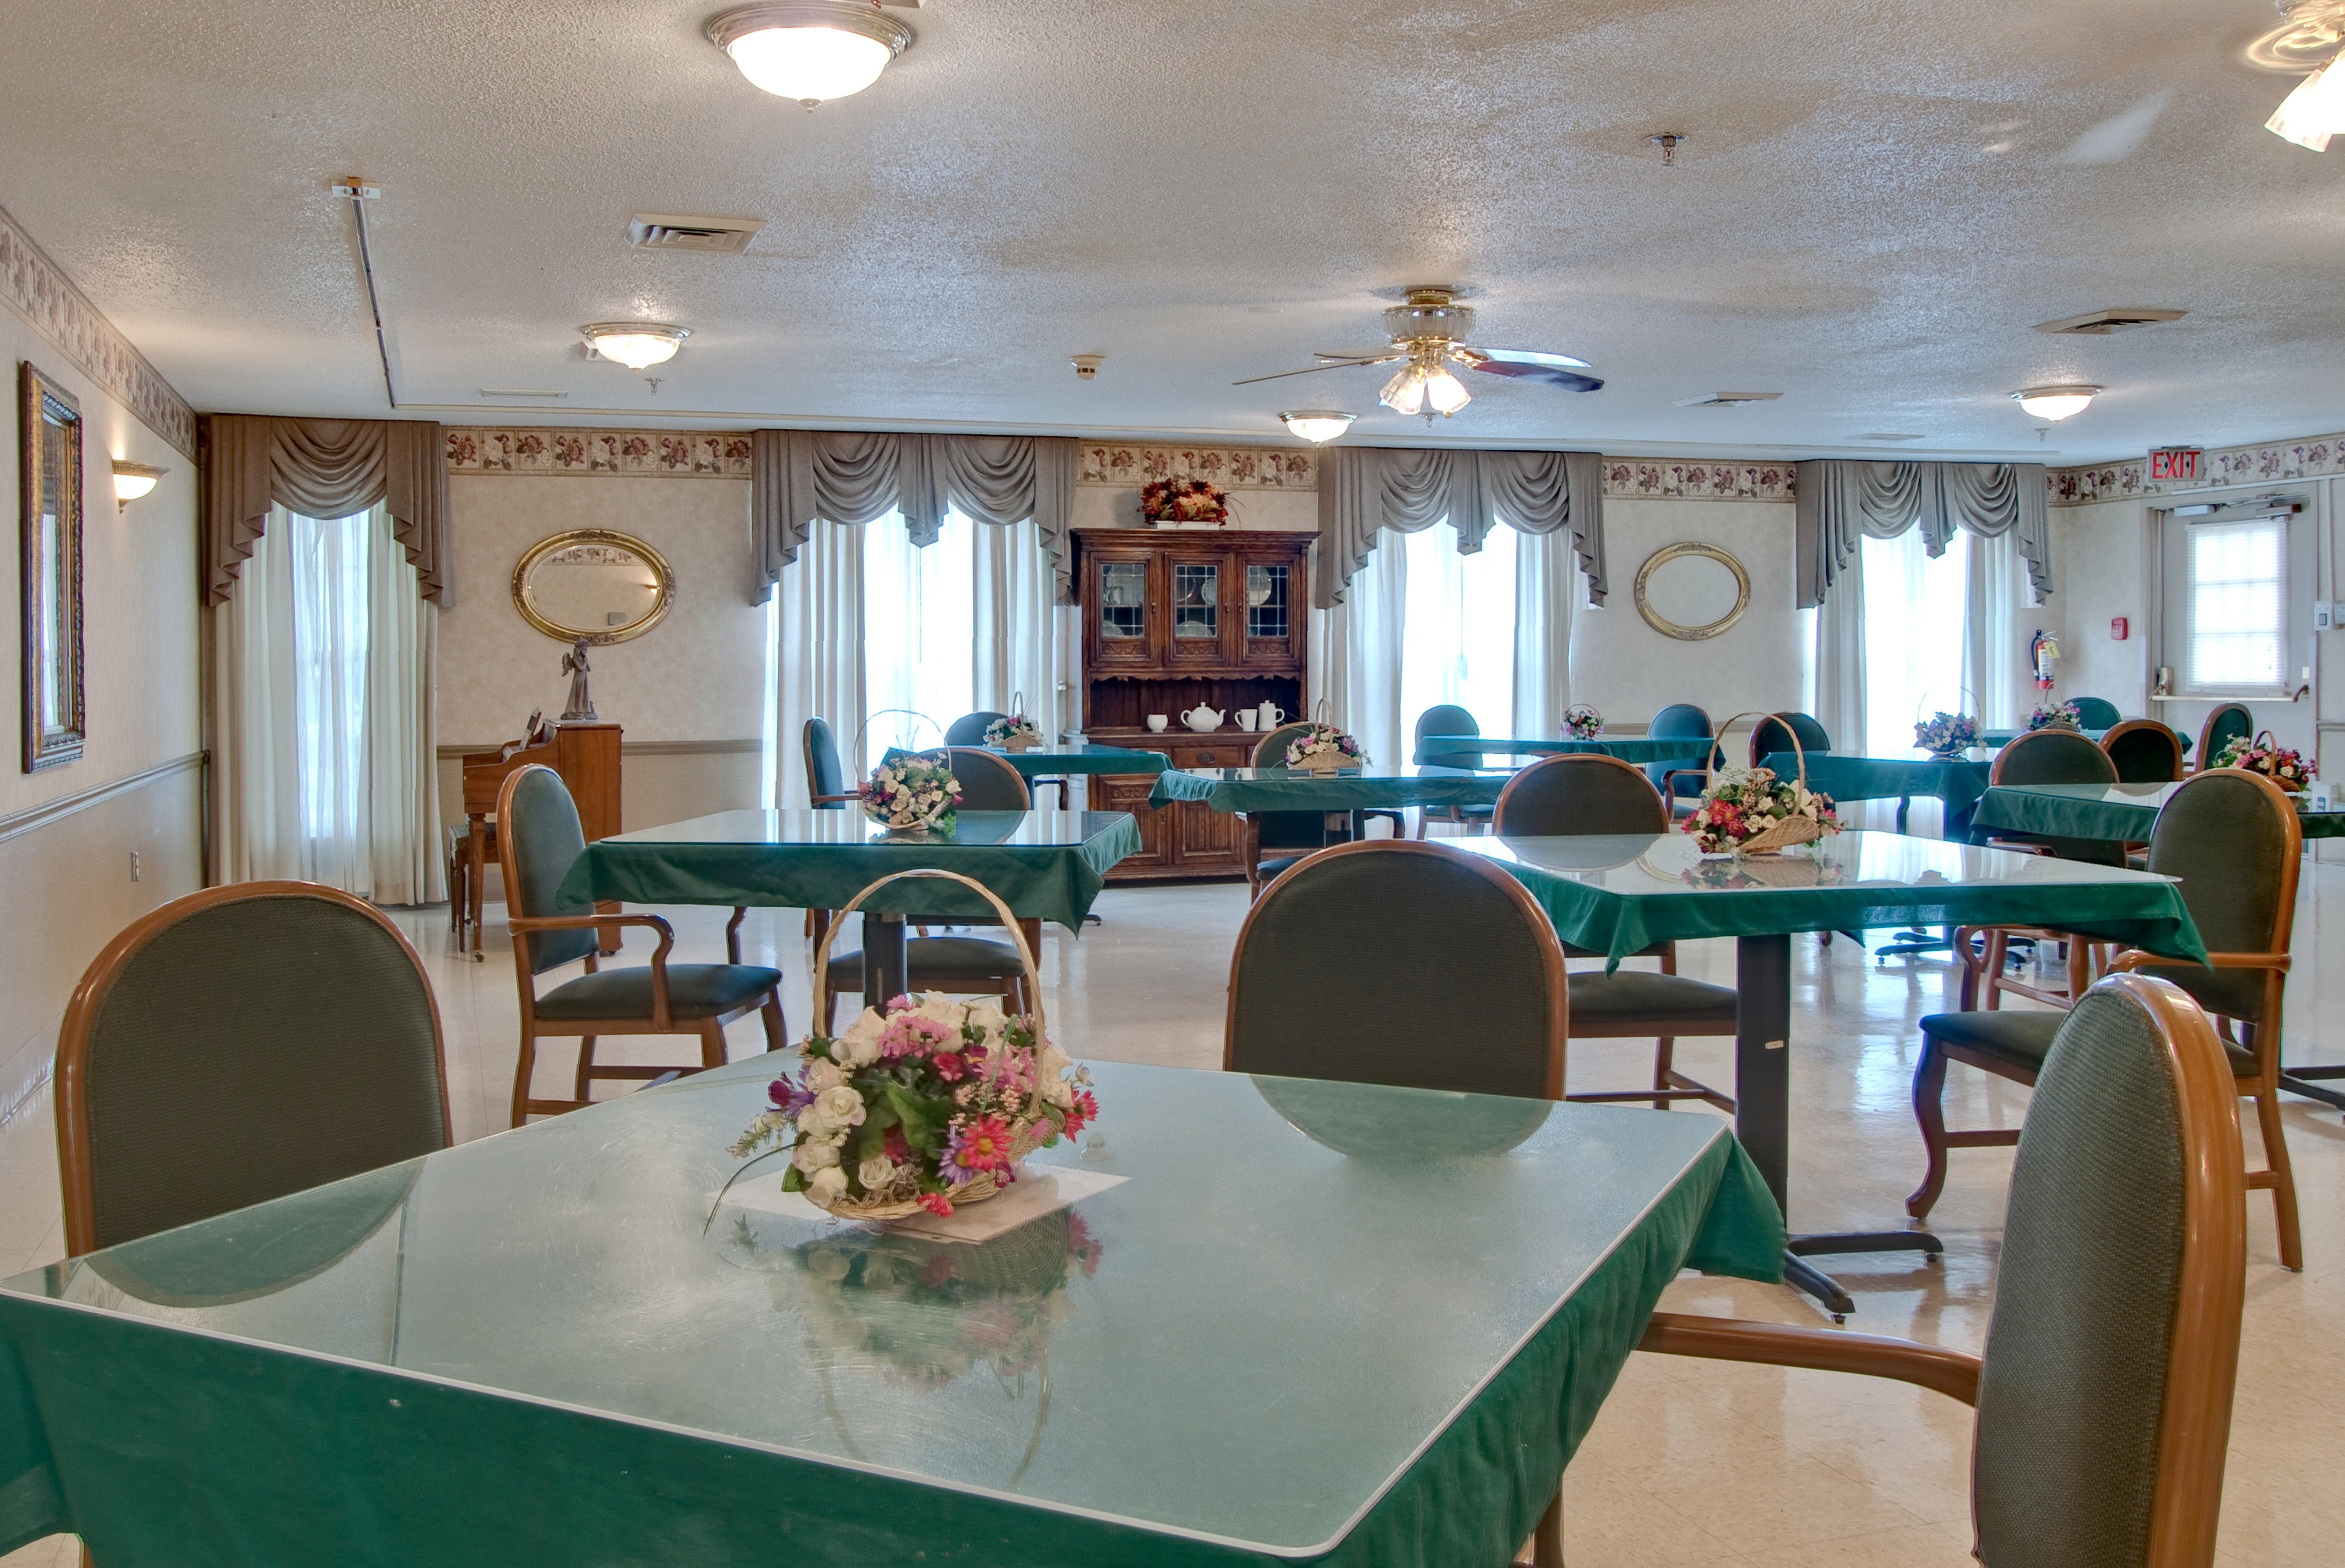 Cypress Grove Rehabilitation Center image 0